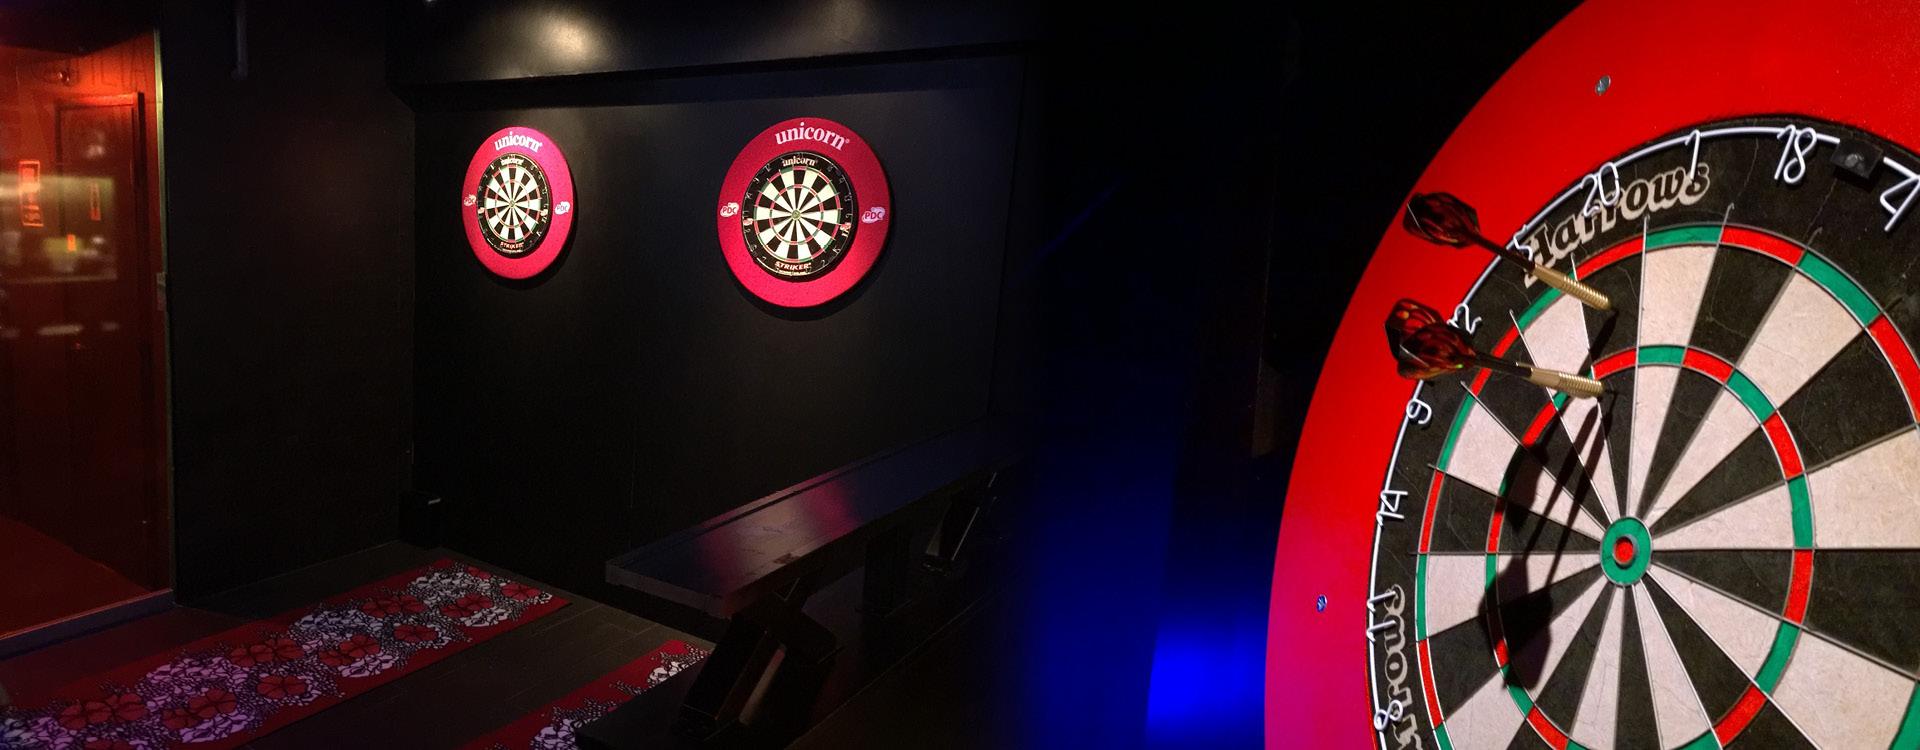 www darts